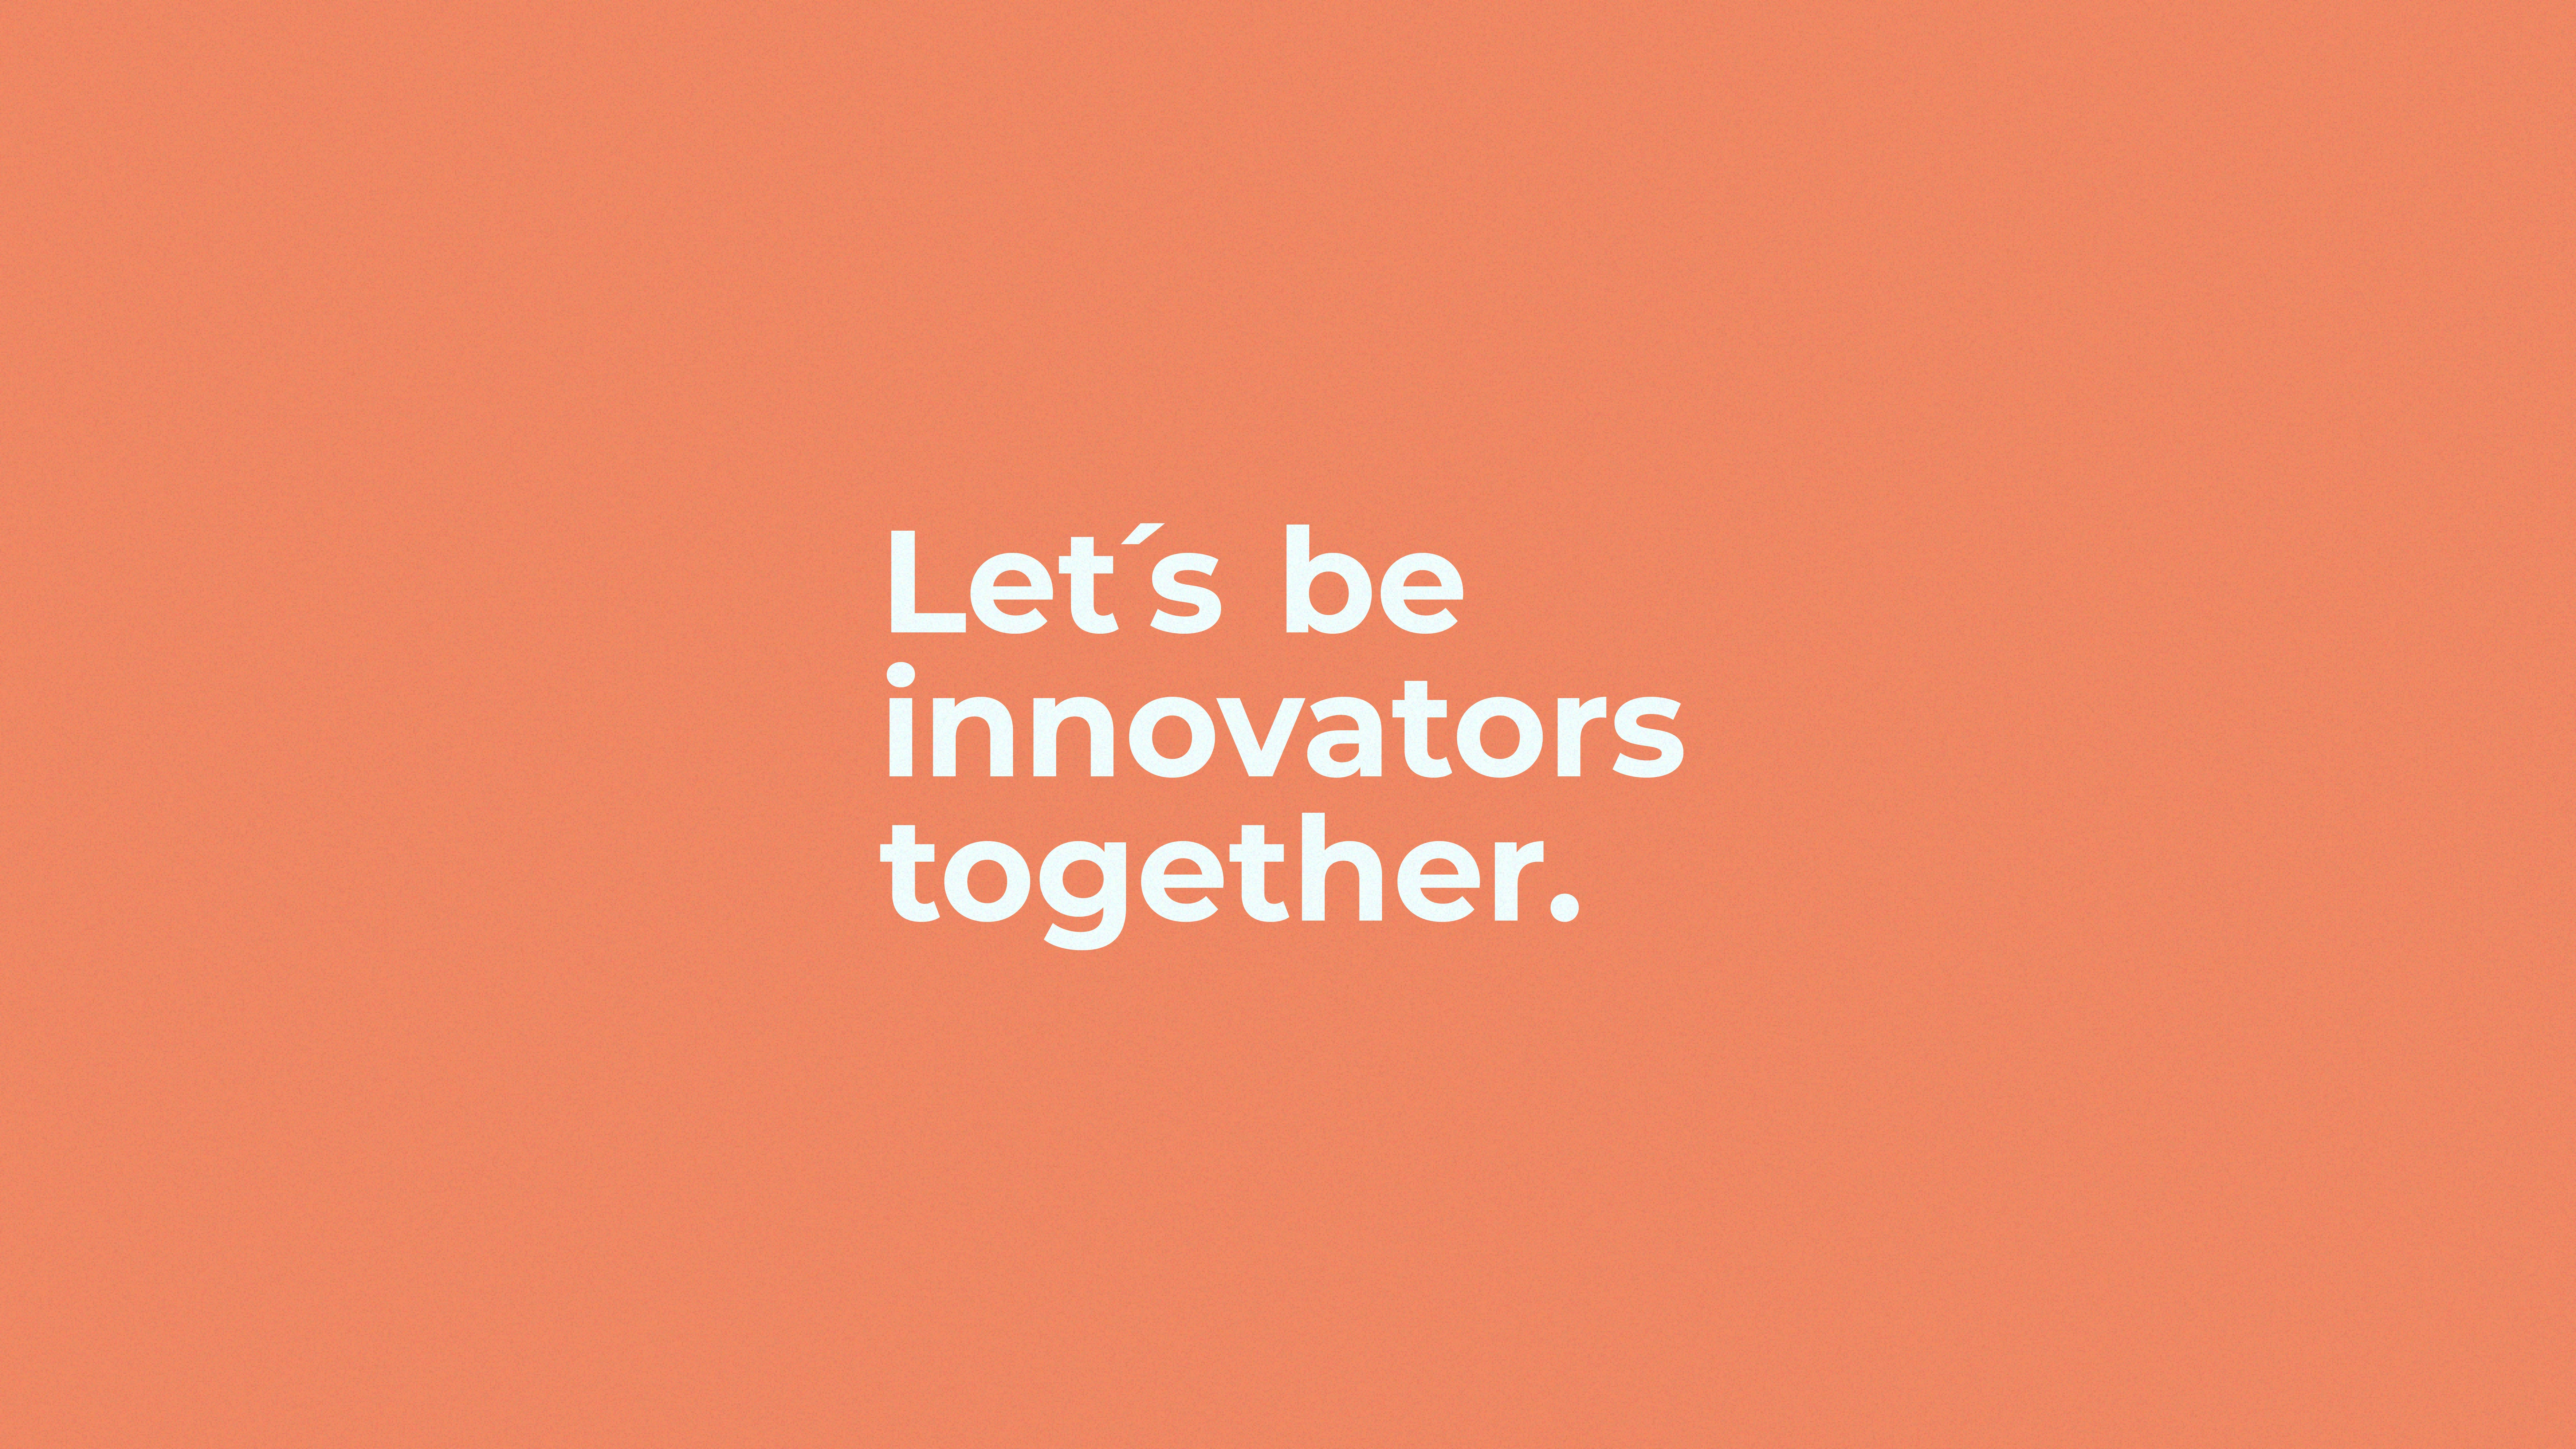 Let's innovate together